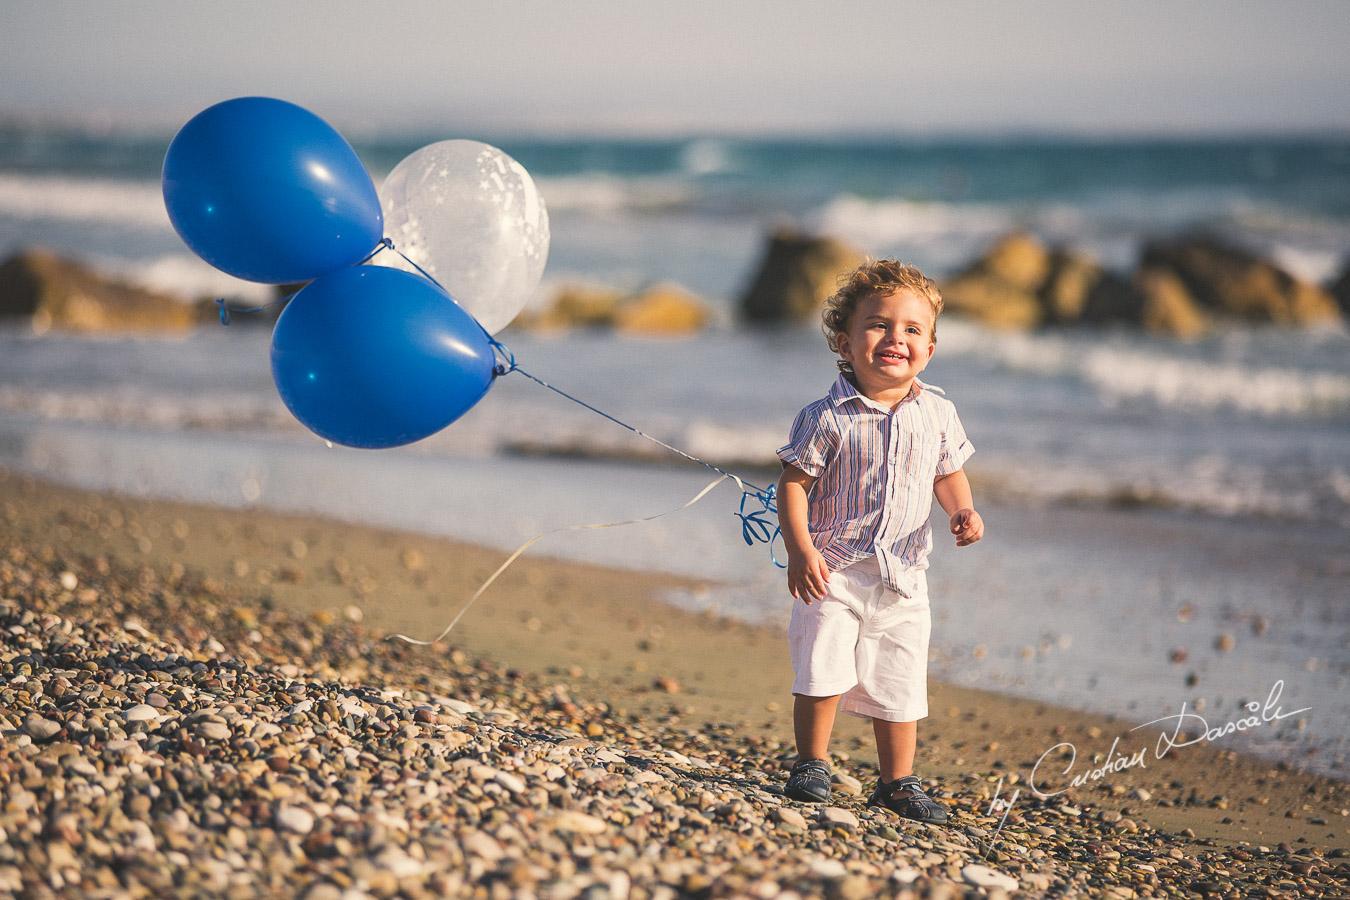 Amazing Limassol Anniversary Photography - Andreas is 1. Photographer: Cristian Dascalu